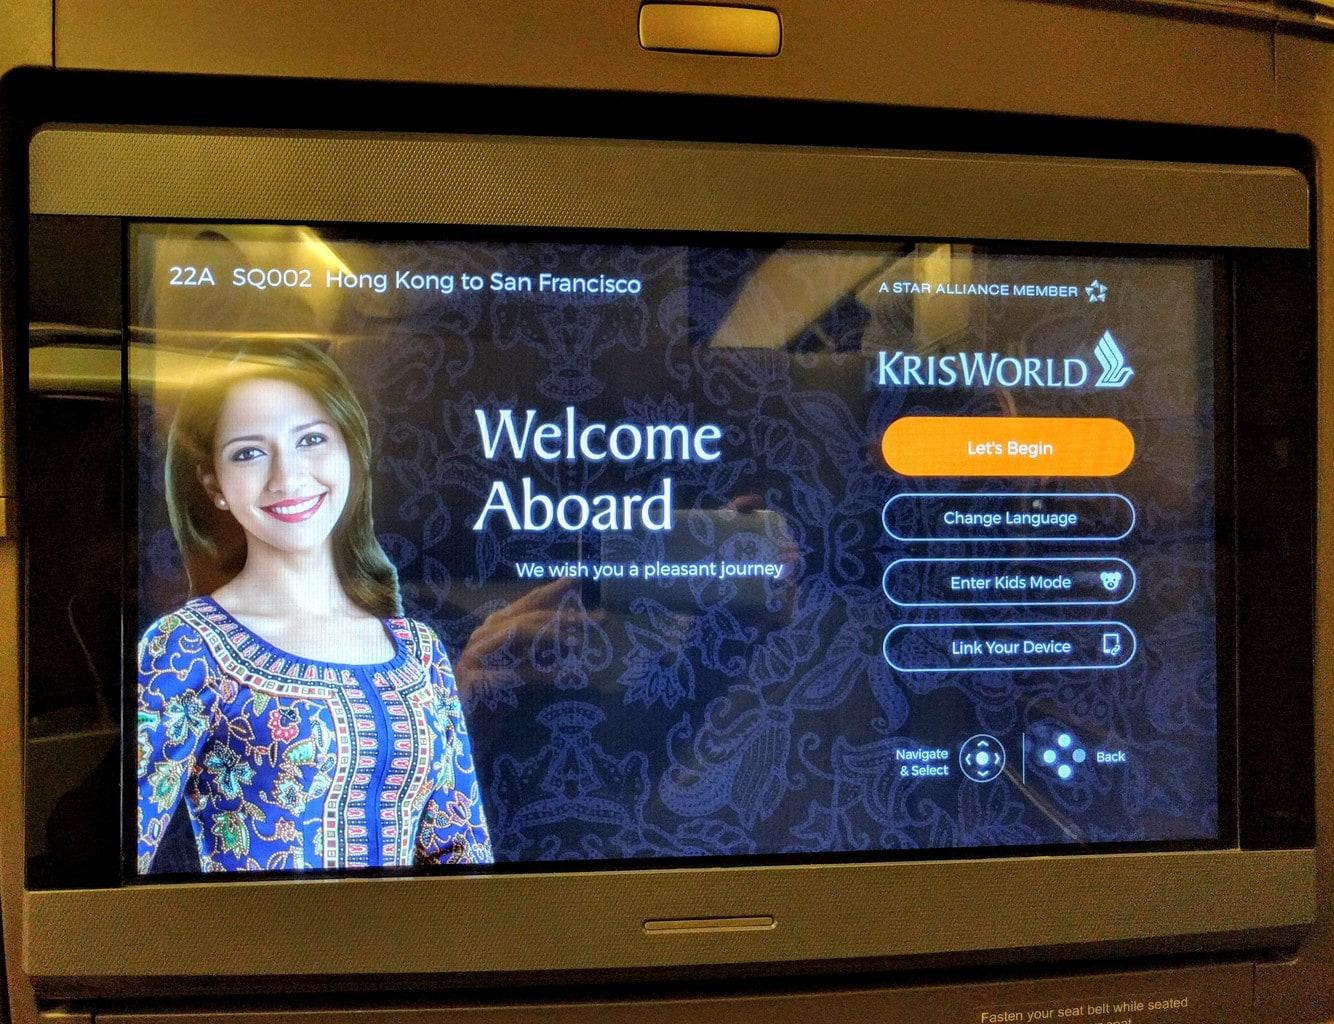 Singapore Airlines Business Class, kris